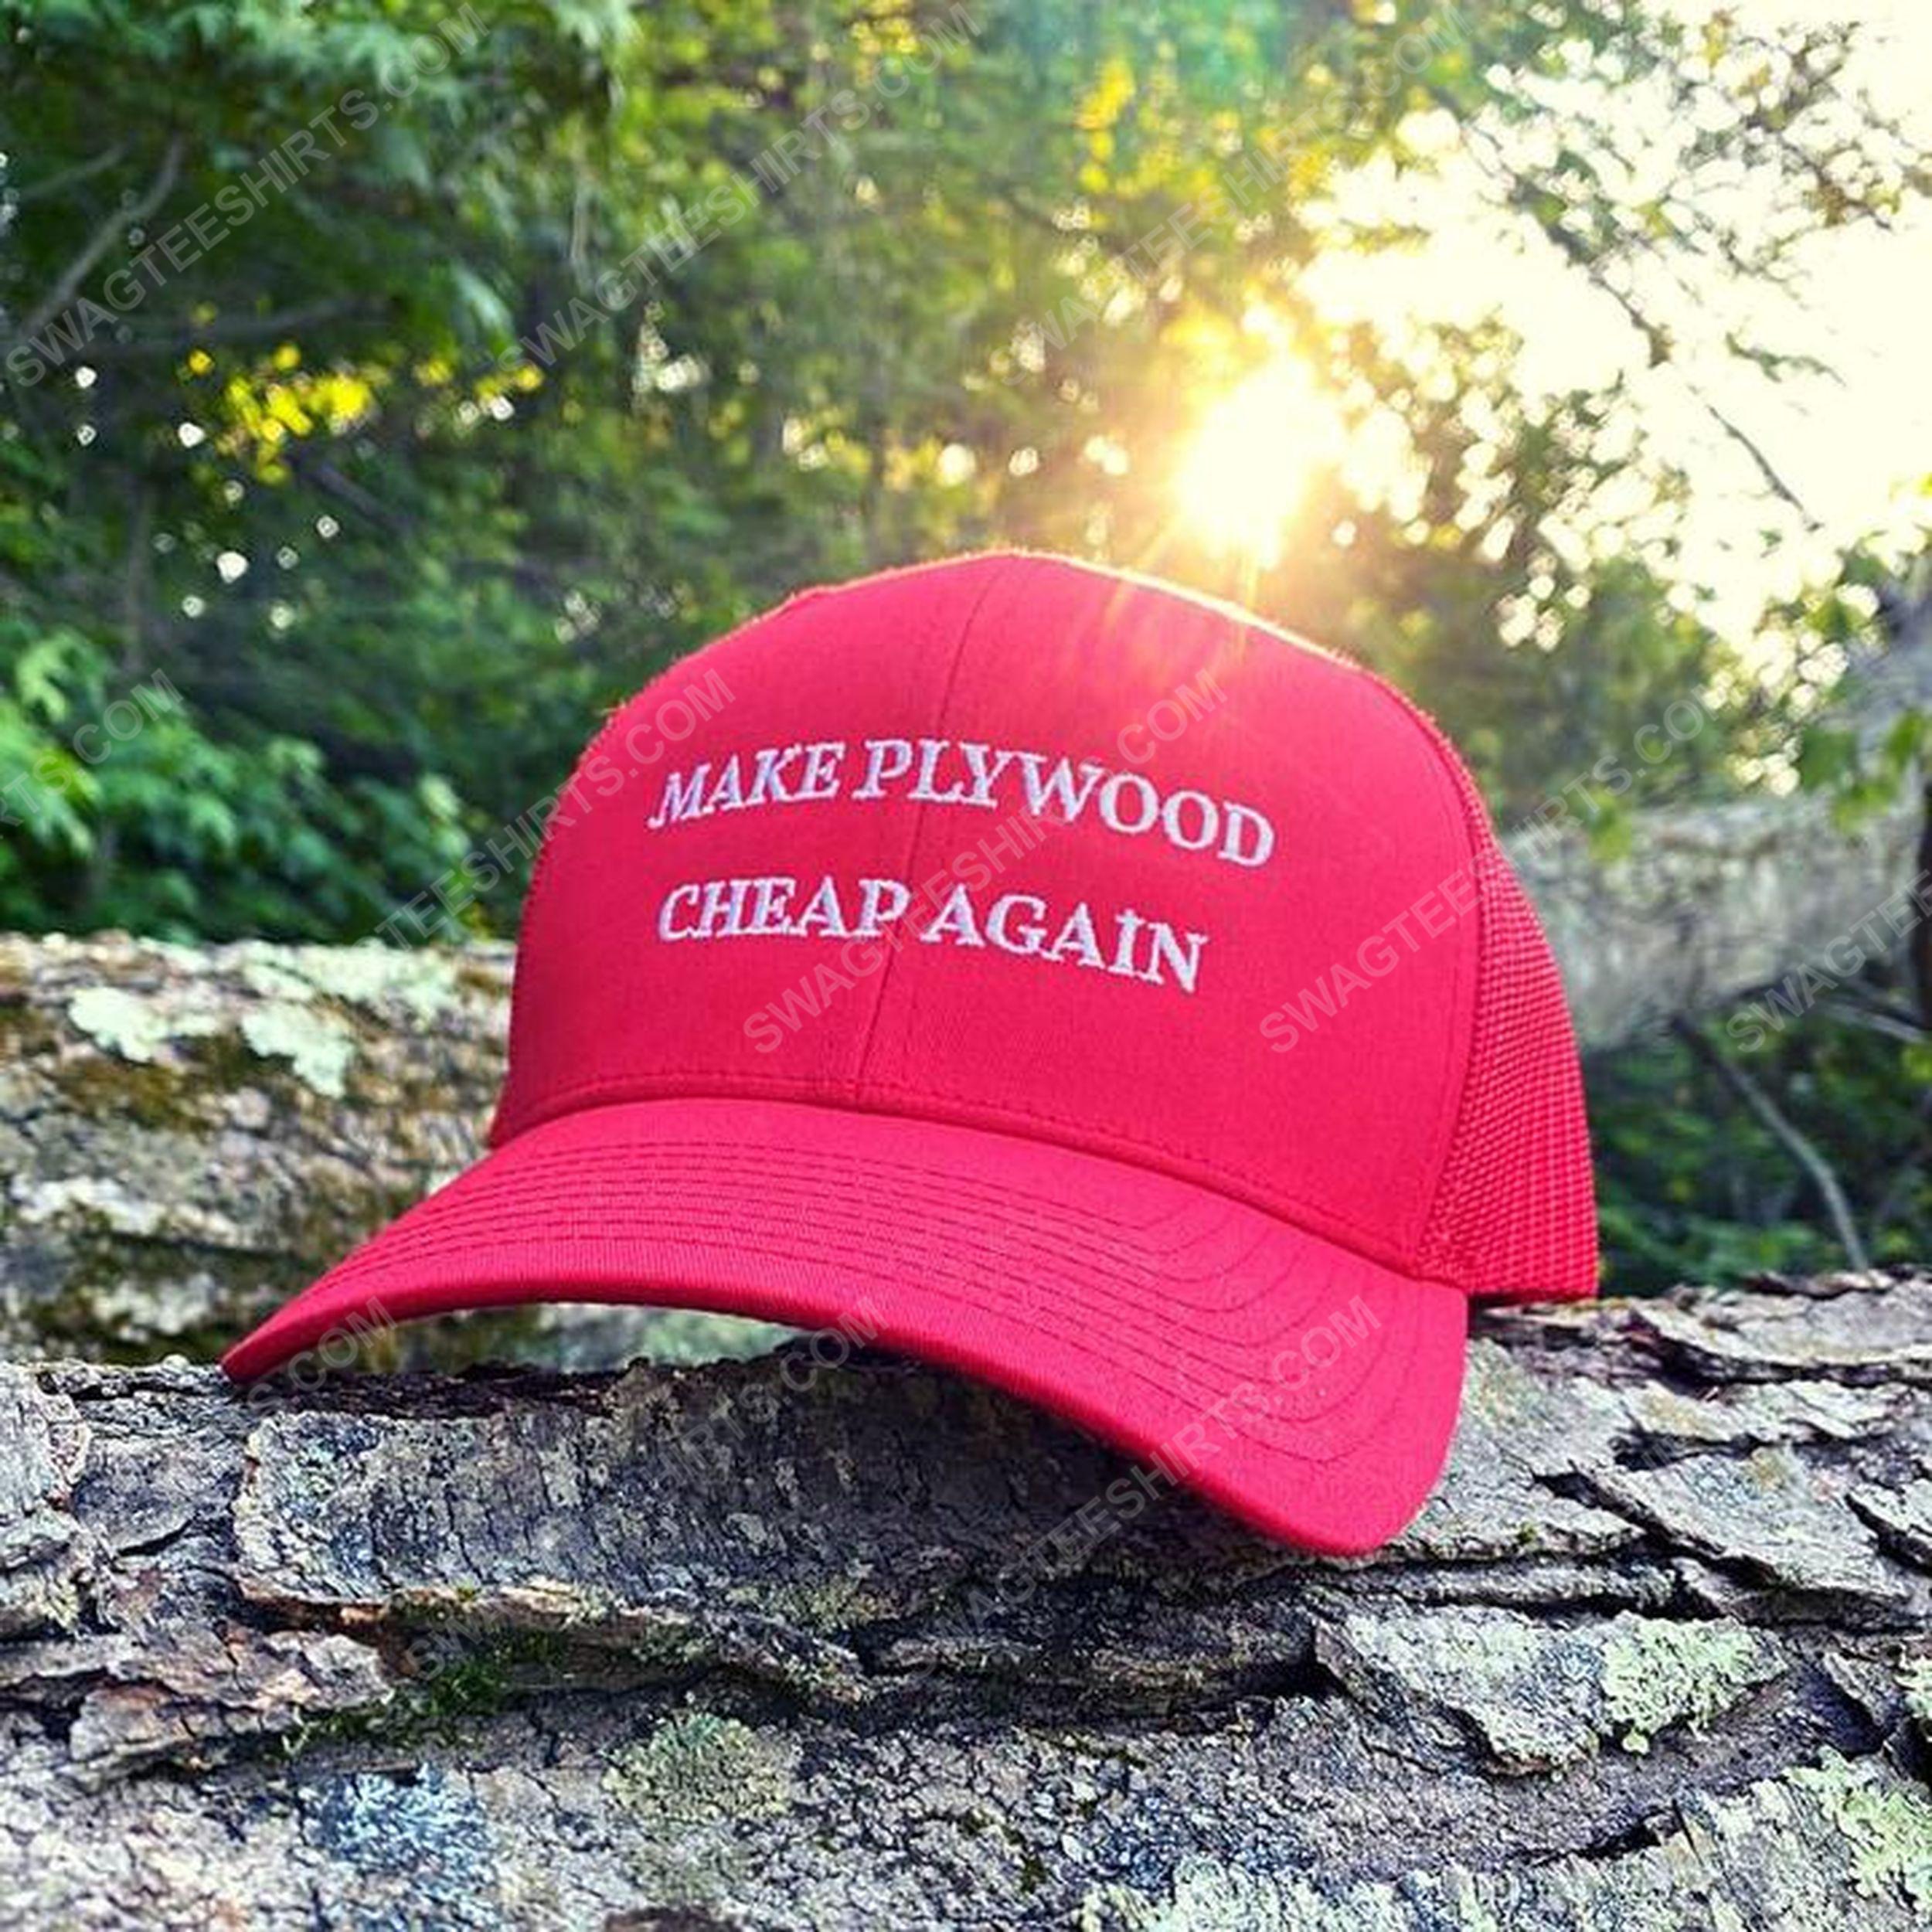 Make plywood cheap again full print classic hat 1 - Copy (2)